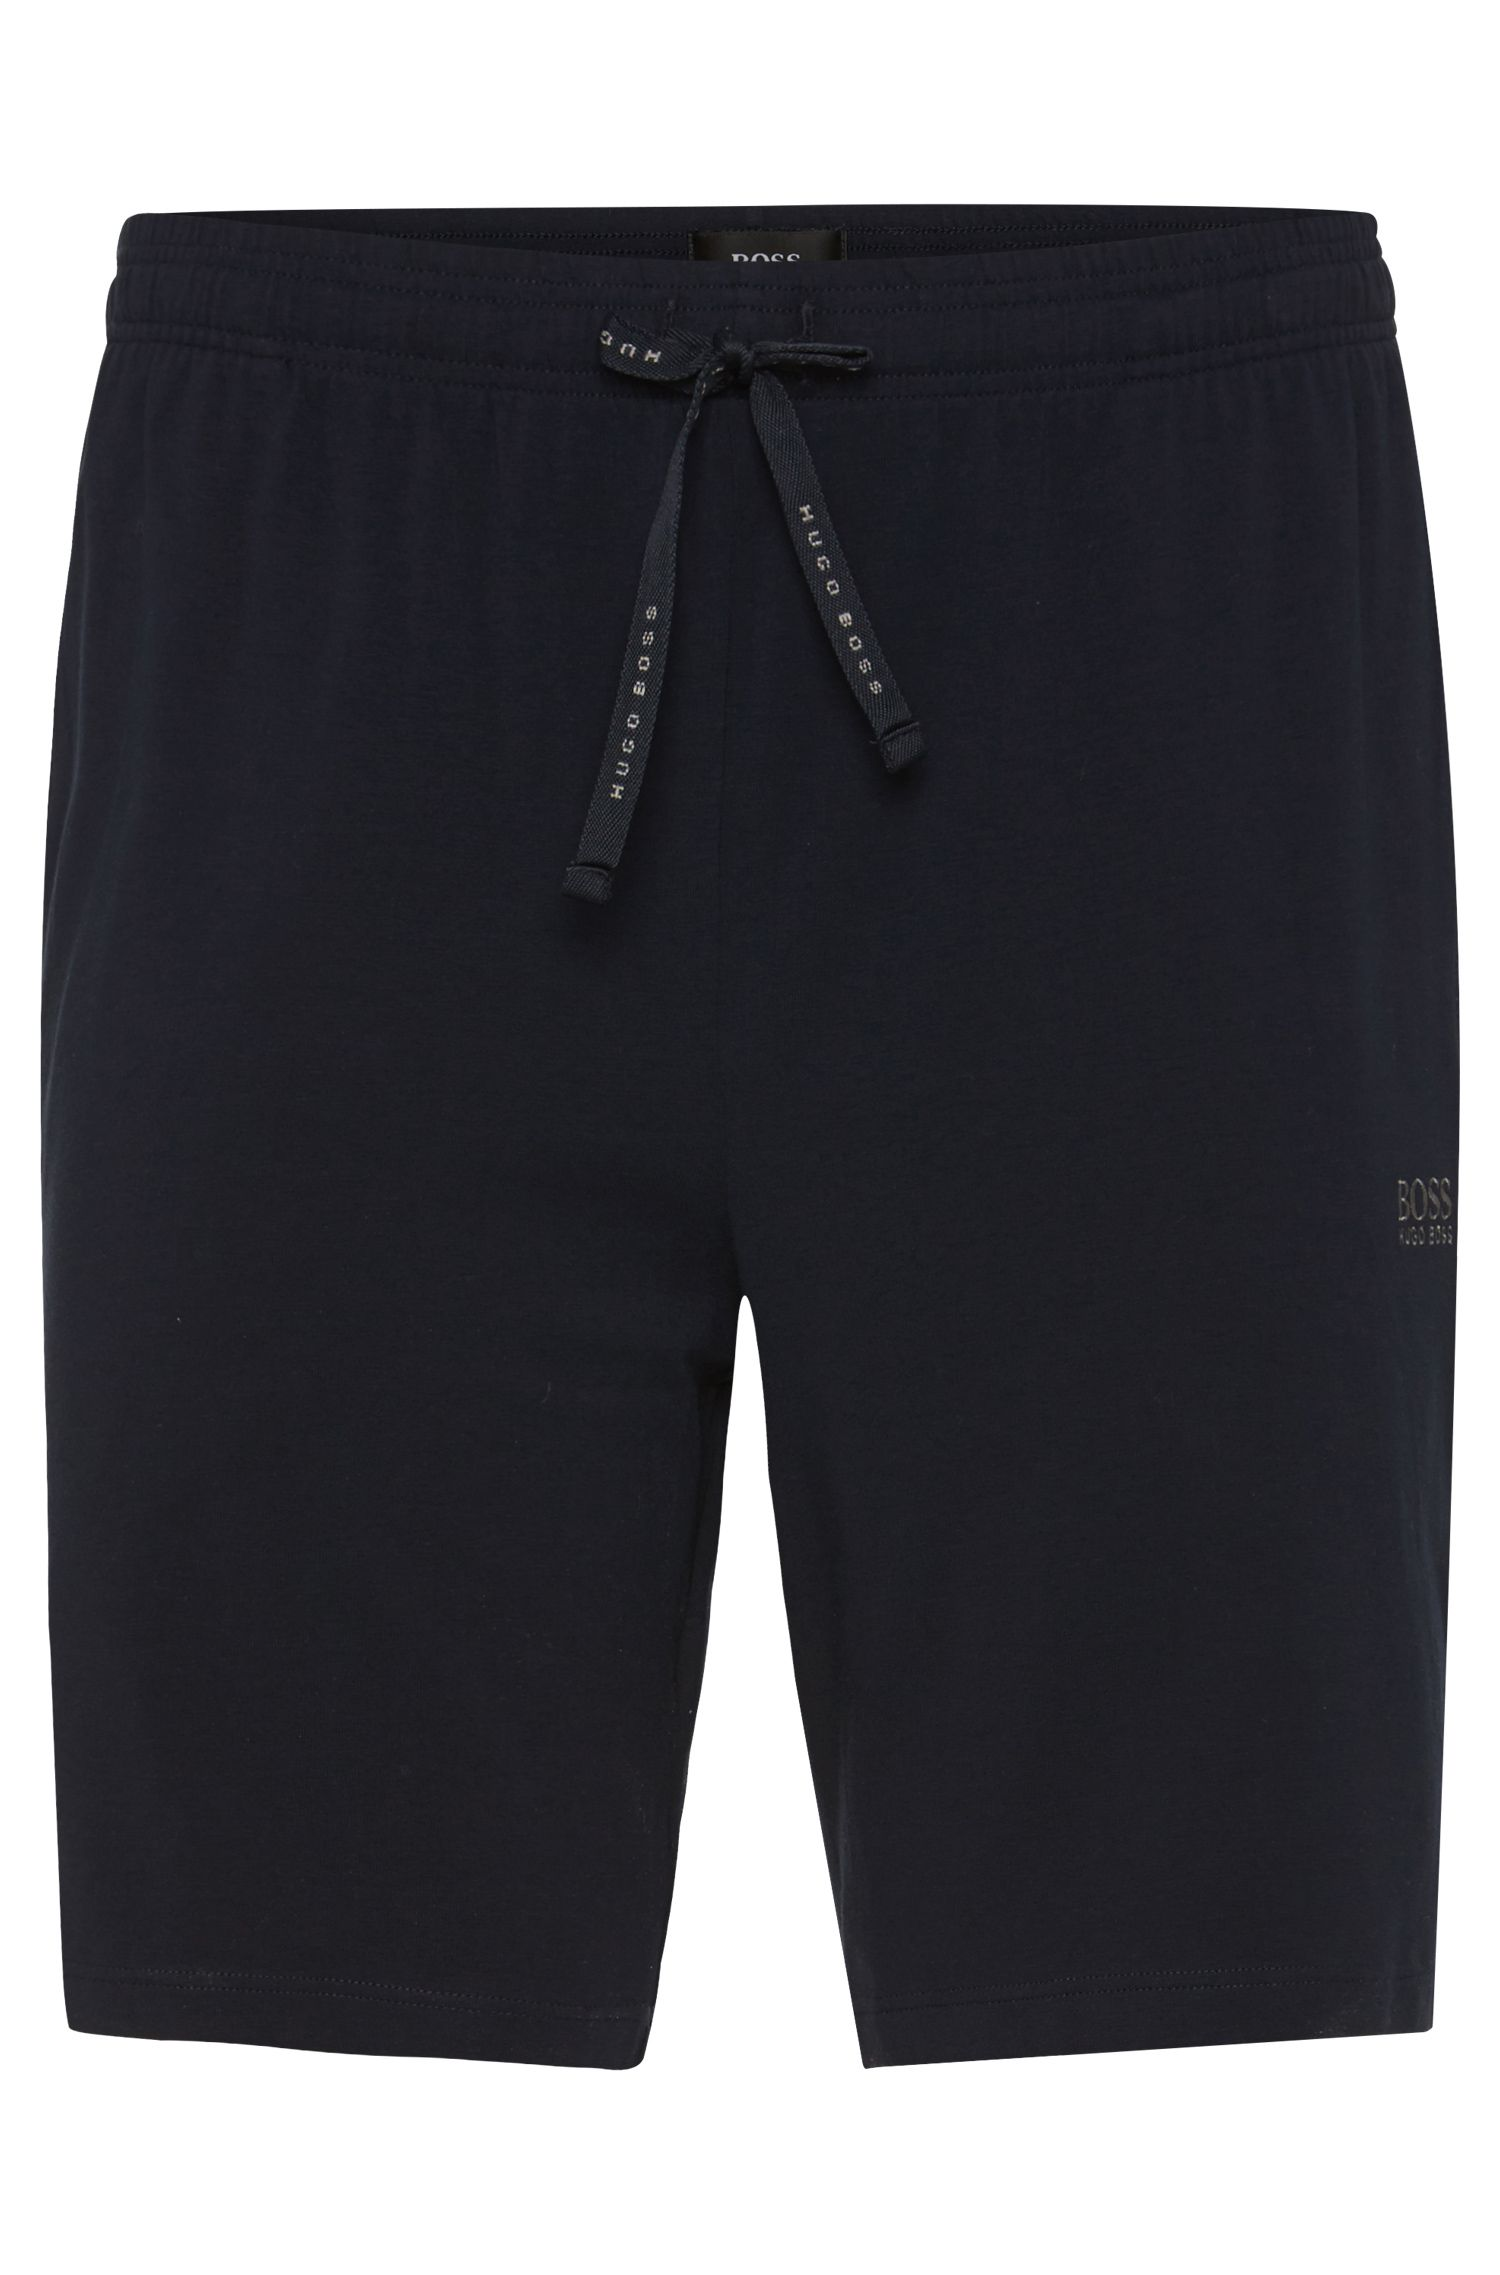 Shorts aus Stretch-Baumwolle: 'Short Pant CV'